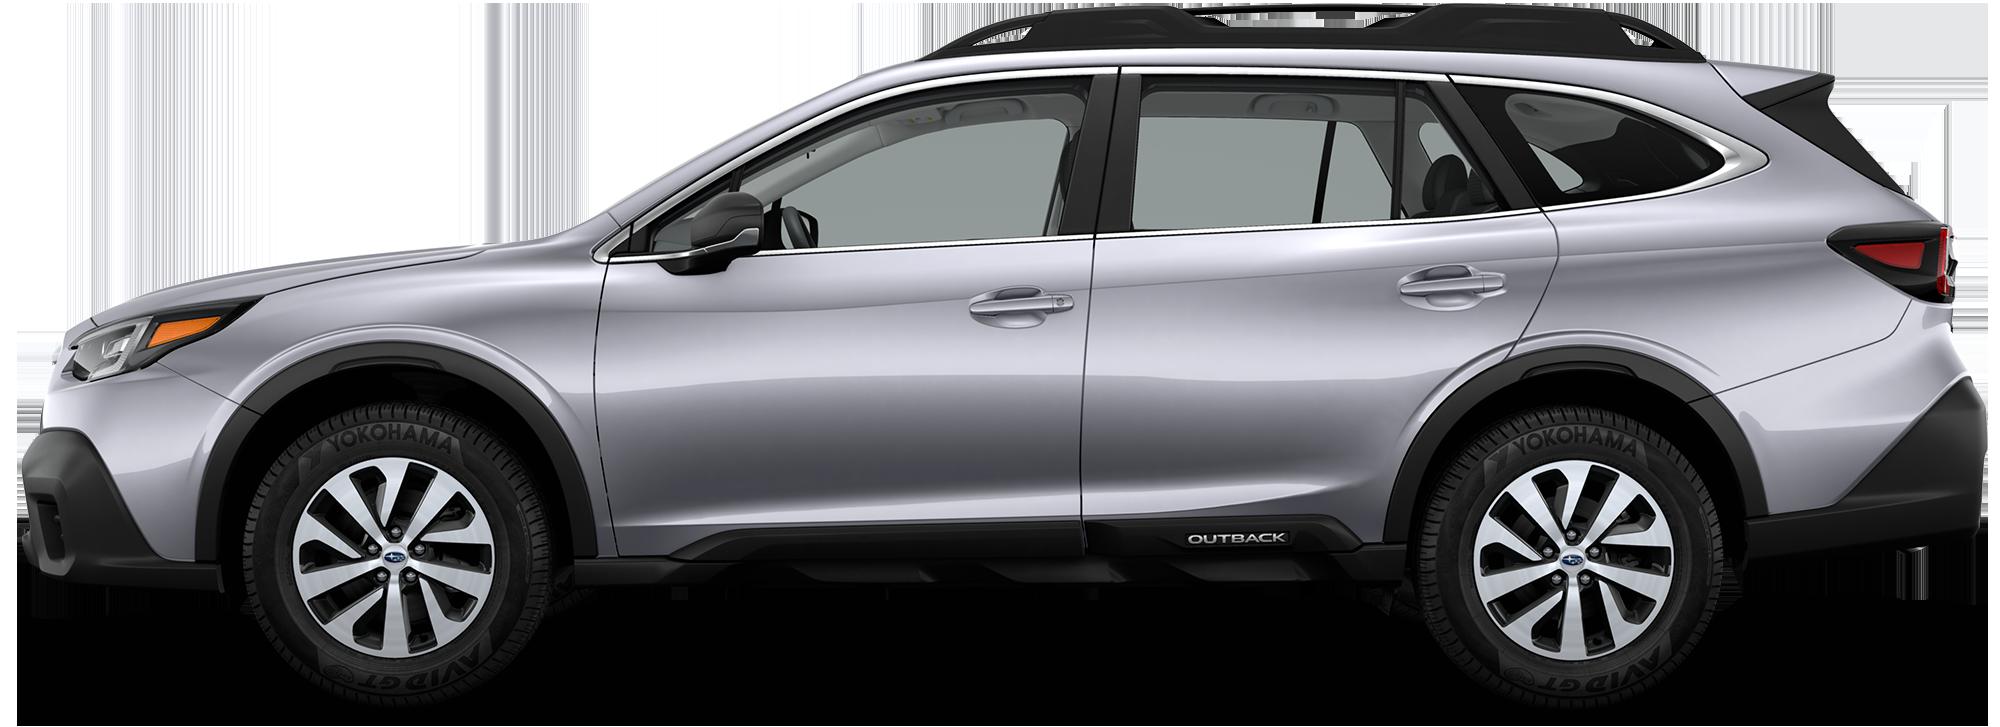 2022 Subaru Outback SUV Base Trim Level